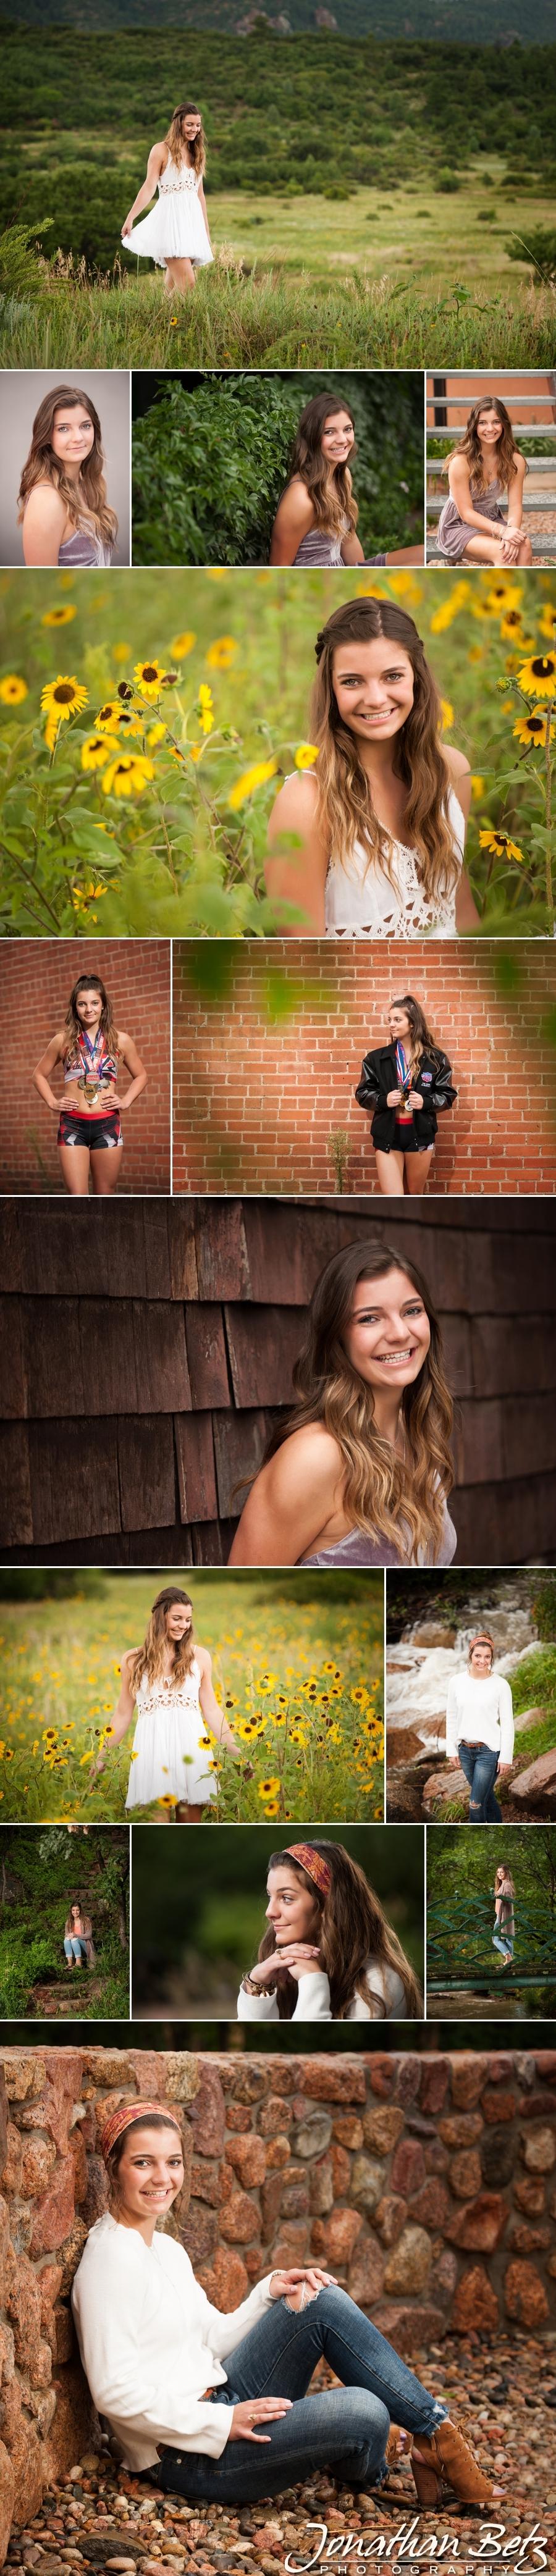 Monumnet Palmer Ridge High School Senior Portraits Jonathan Betz Photography Colorado Springs Photographer